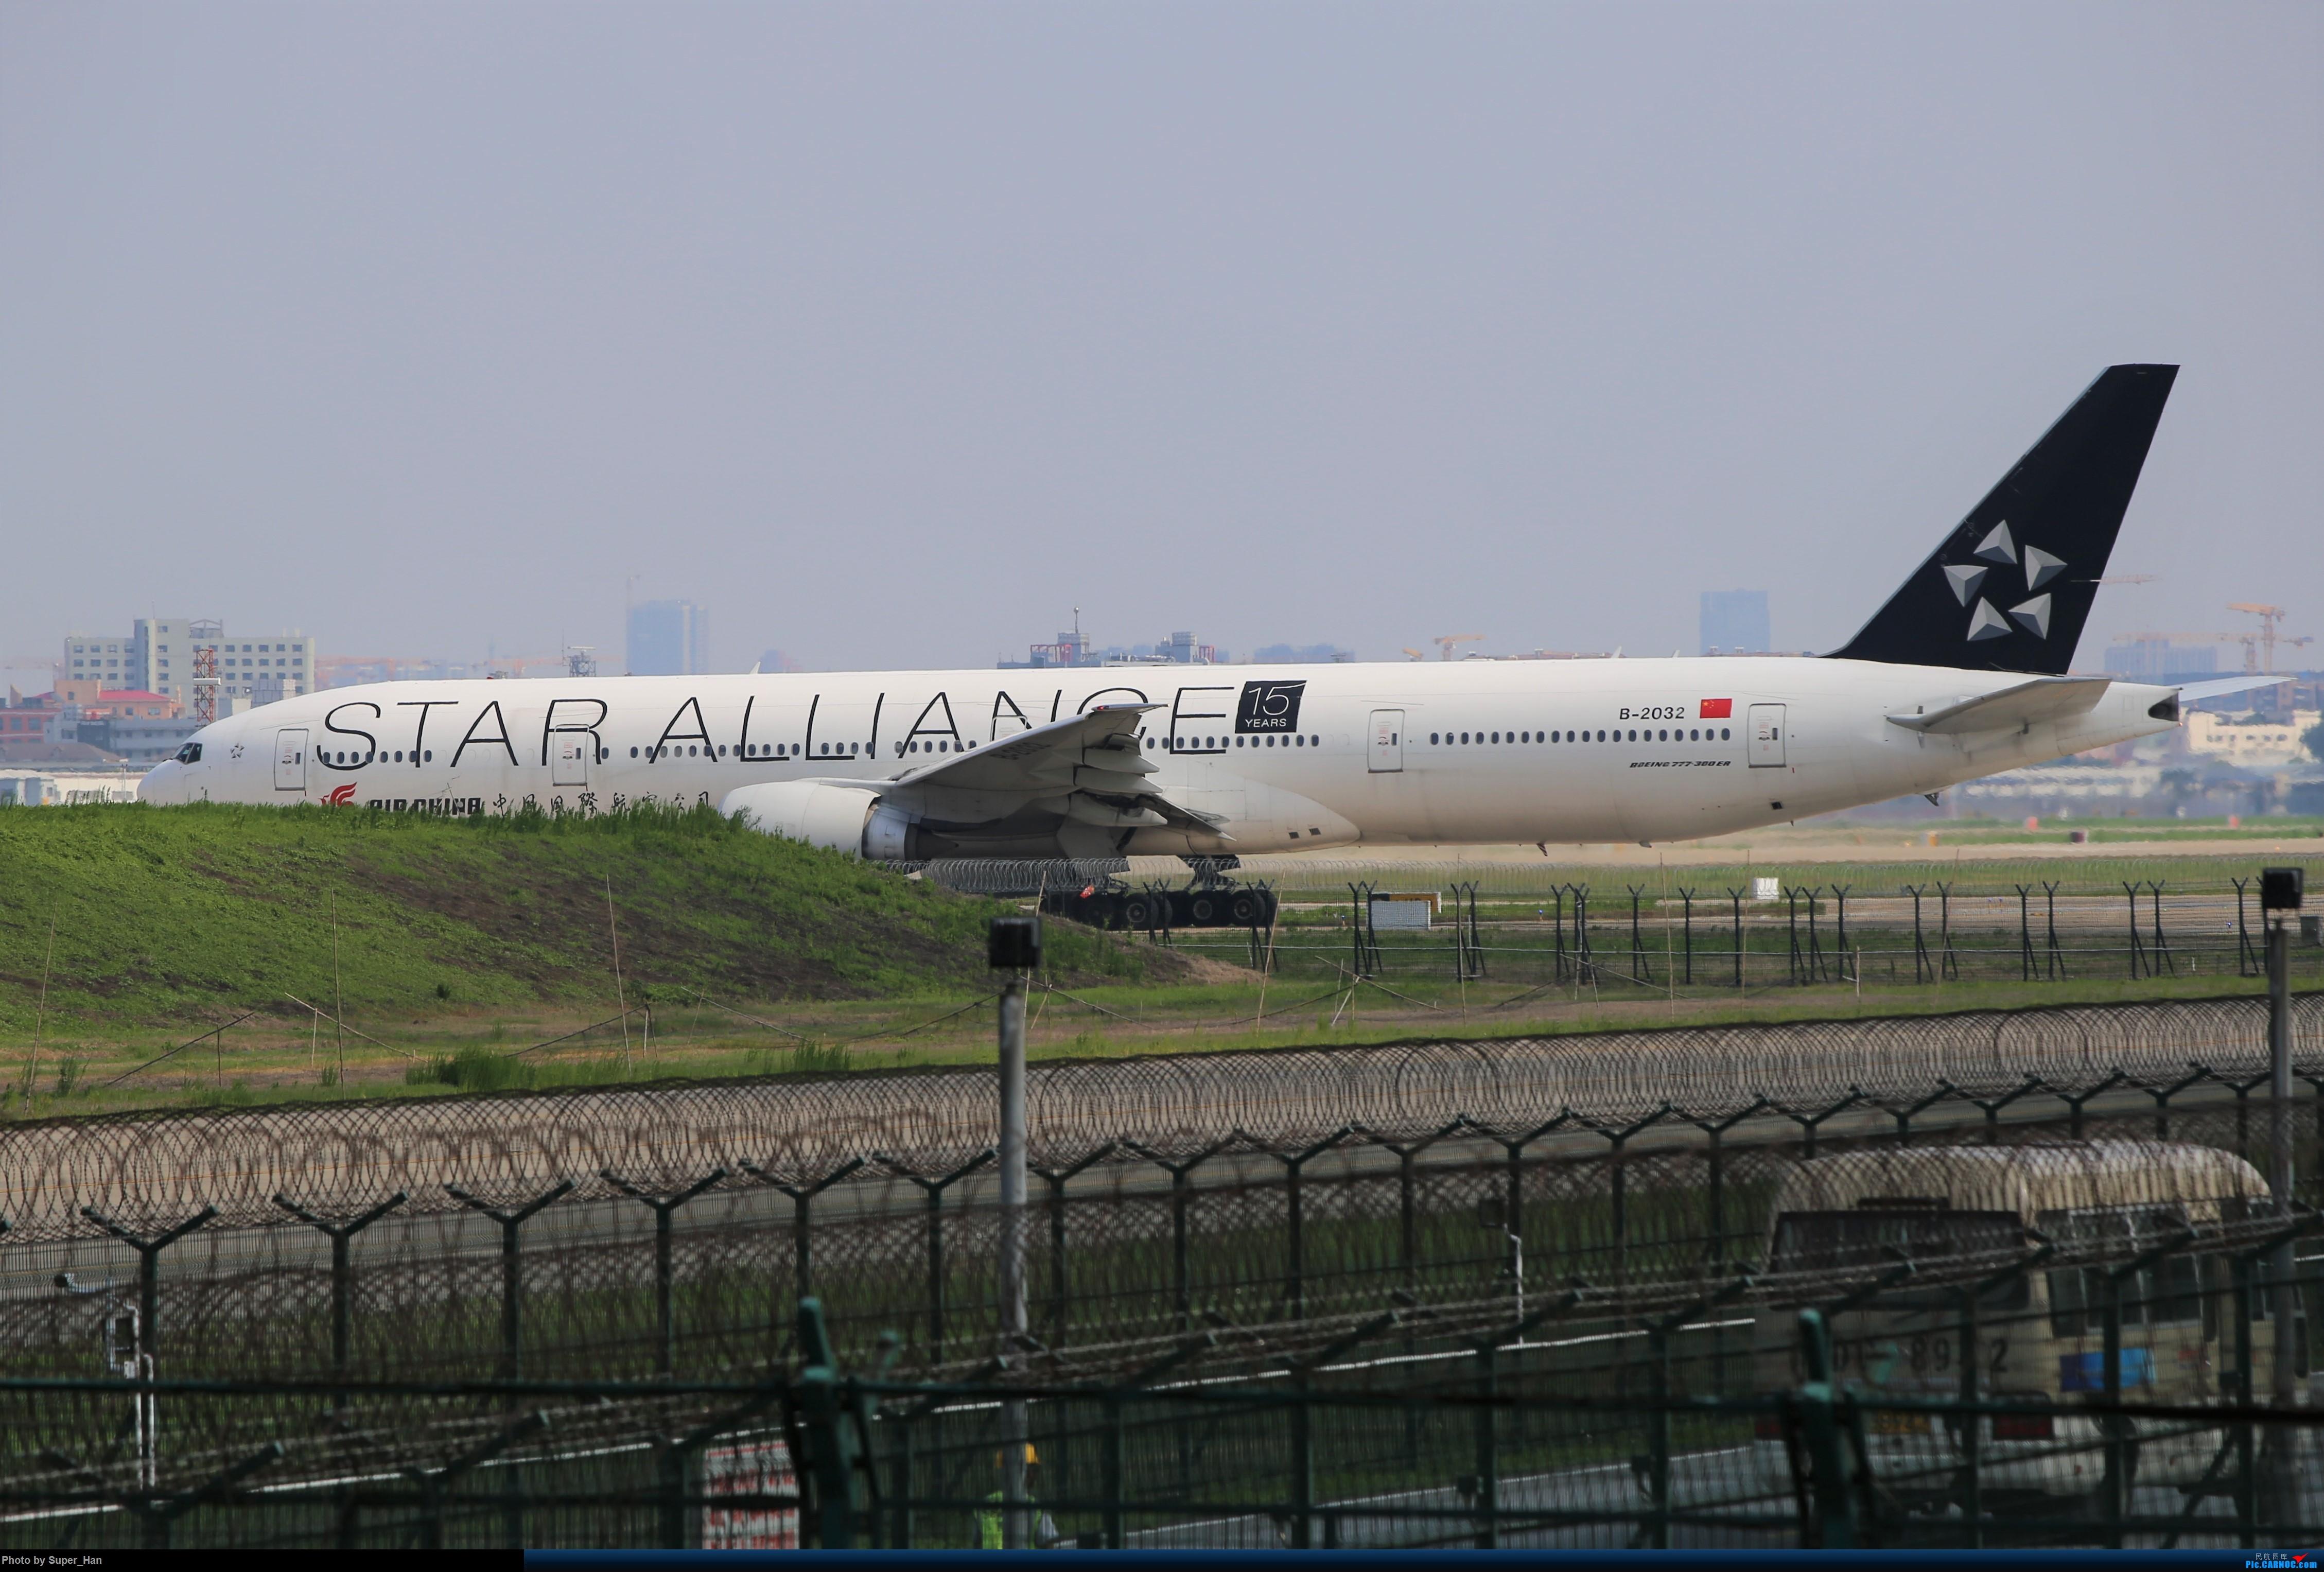 Re:[原创]【杭州飞友会】0715去虹桥说走就走【777篇】 BOEING 777-300ER B-2032 中国上海虹桥国际机场